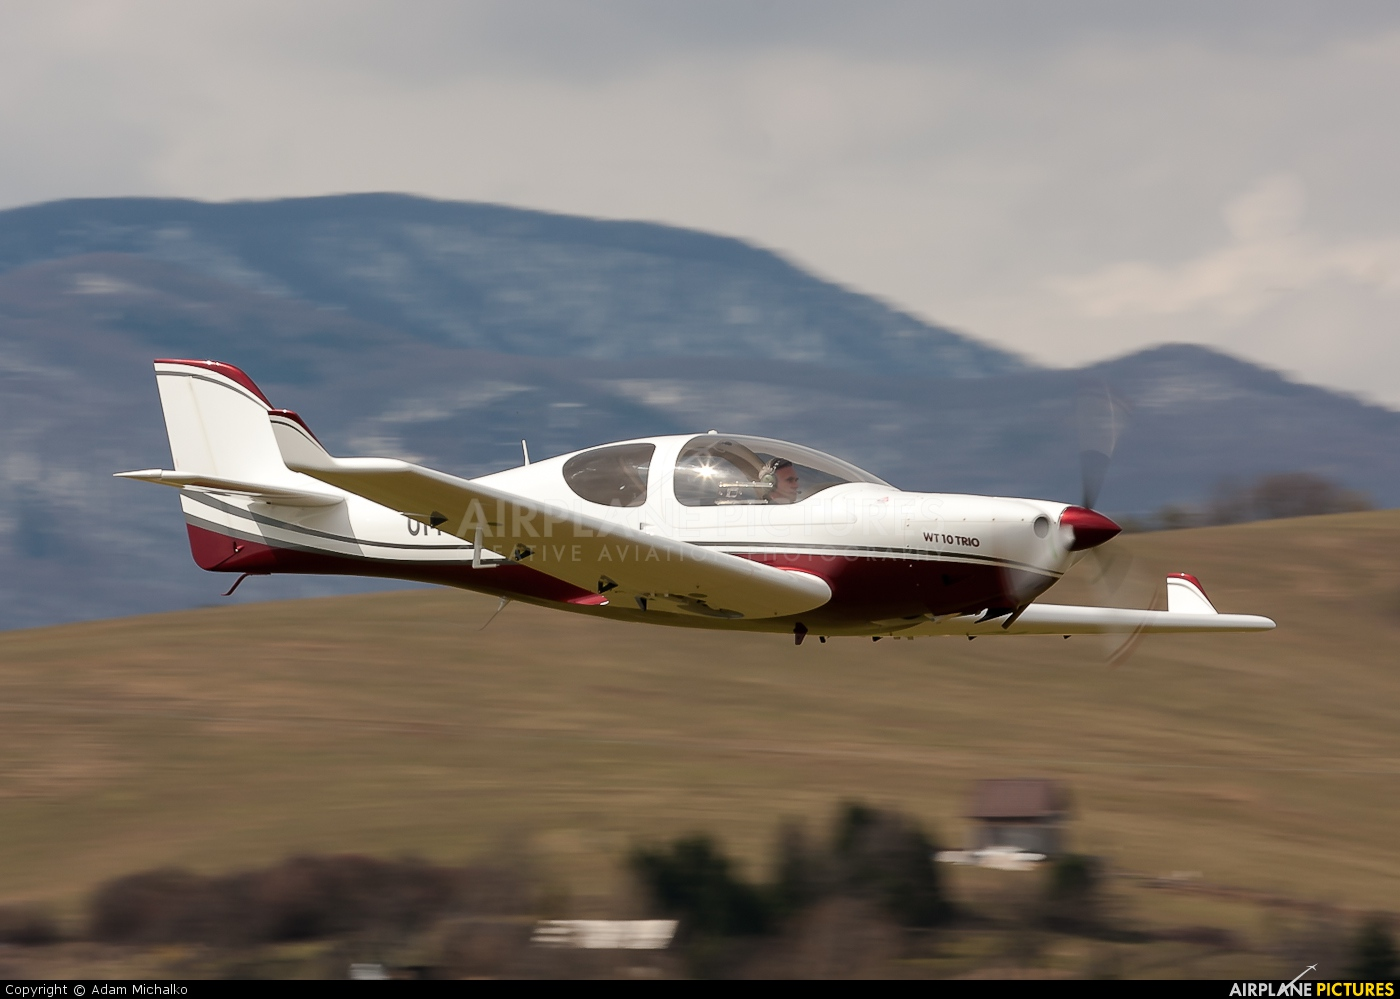 OM-DYX - Aerospool Aerospol WT-10 Advantic at Prievidza ...